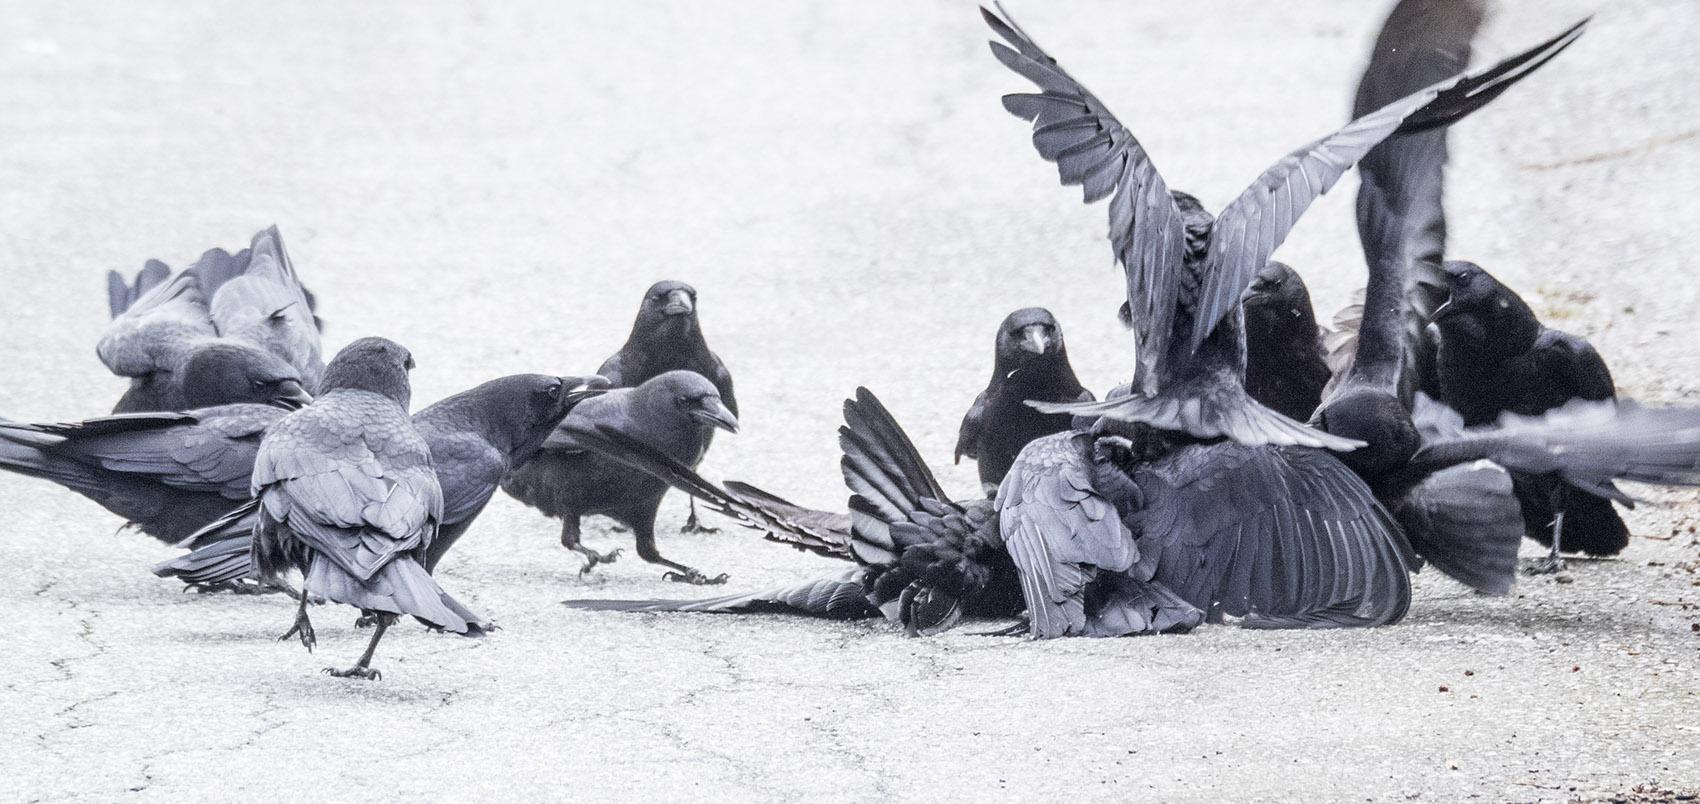 Crow Fight 2